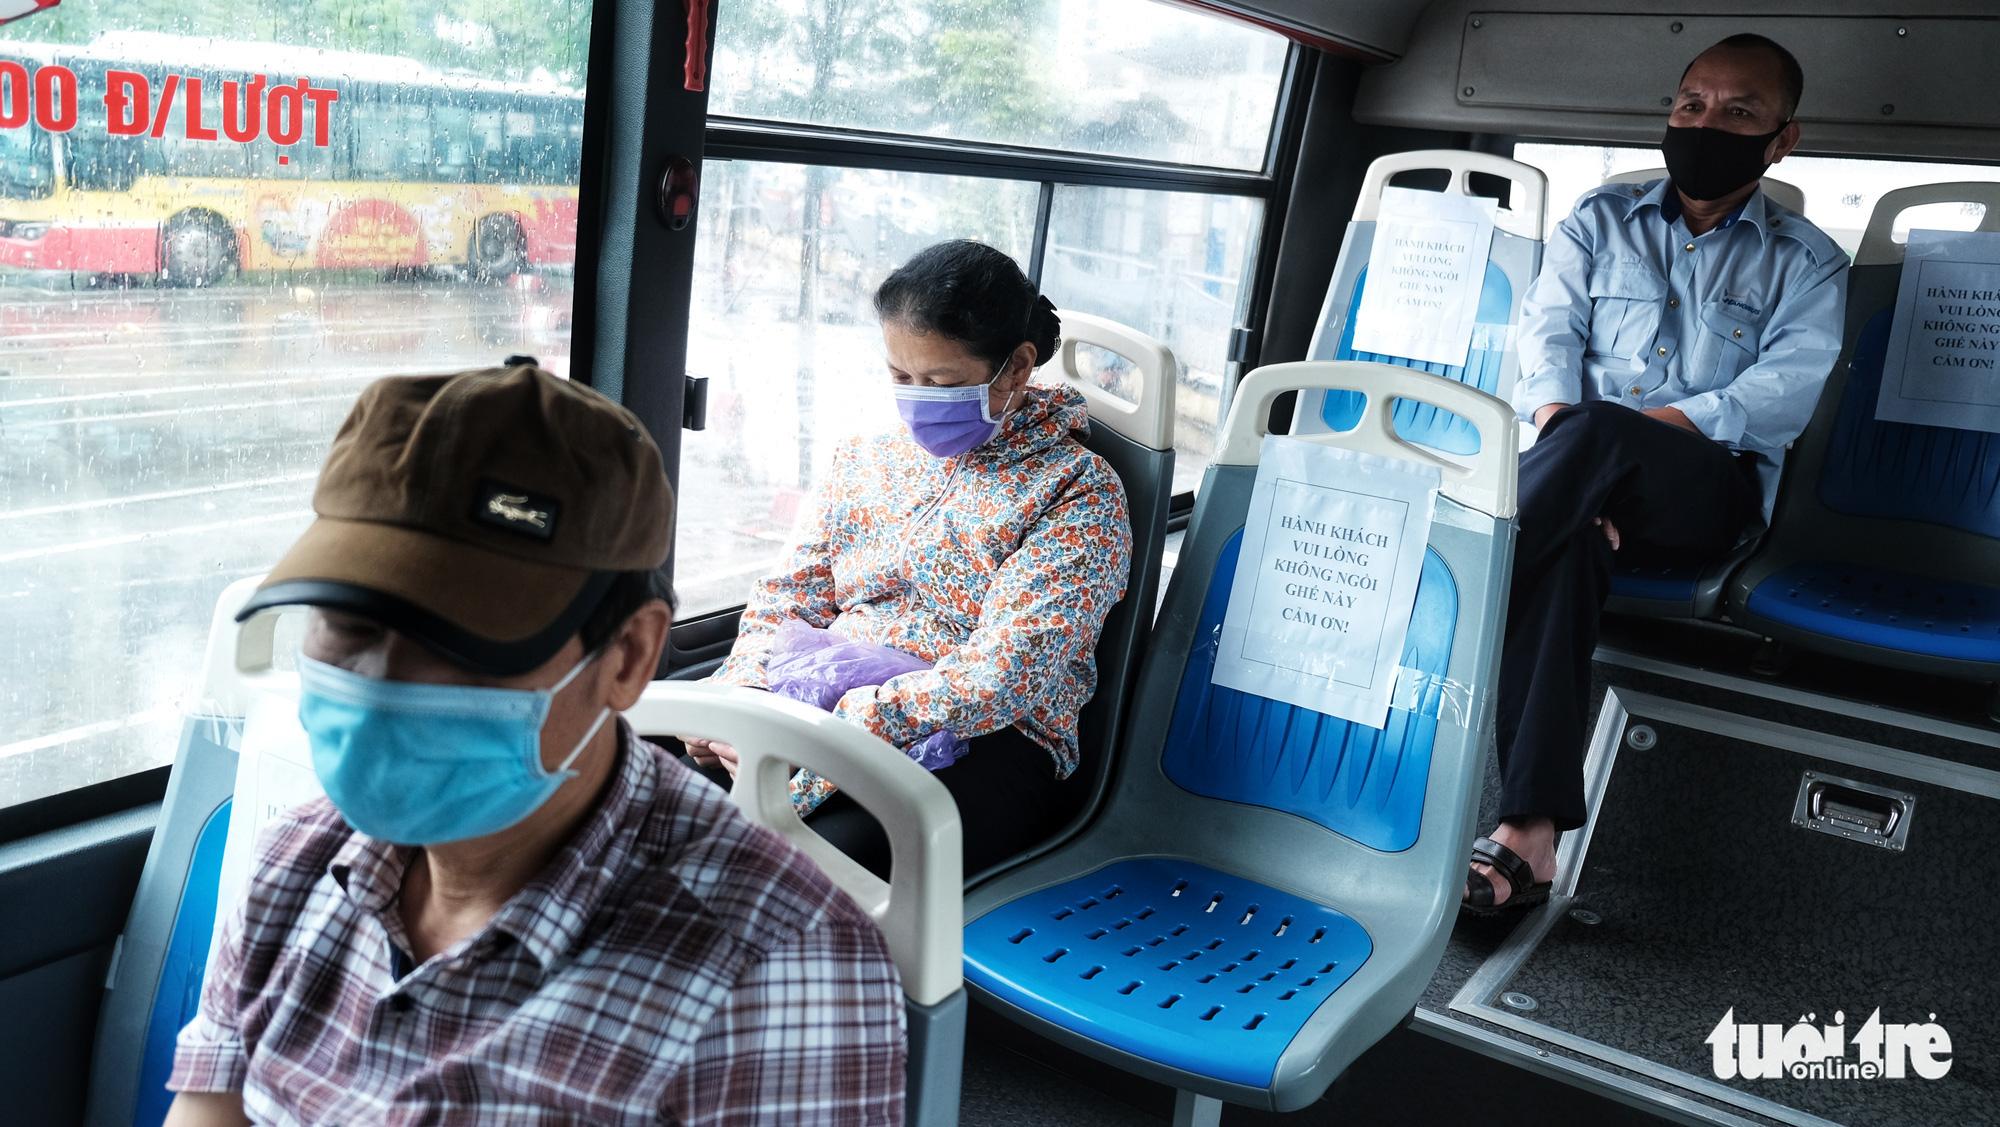 Vietnam lifts distancing rule on planes, public transport